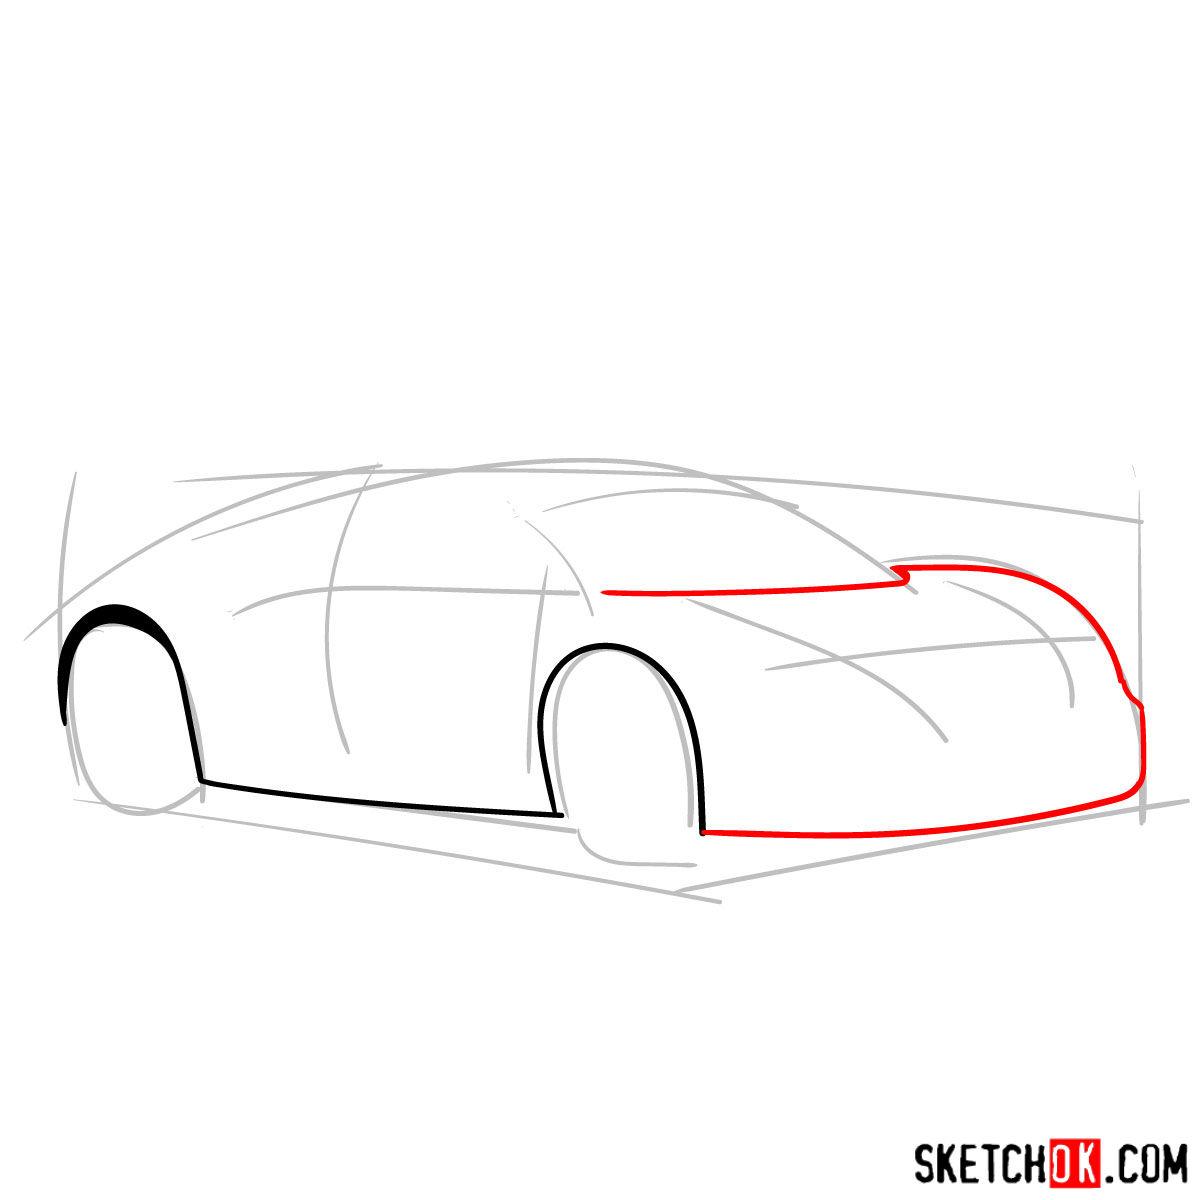 How to draw Bugatti Veyron 16.4 Super Sport - step 03